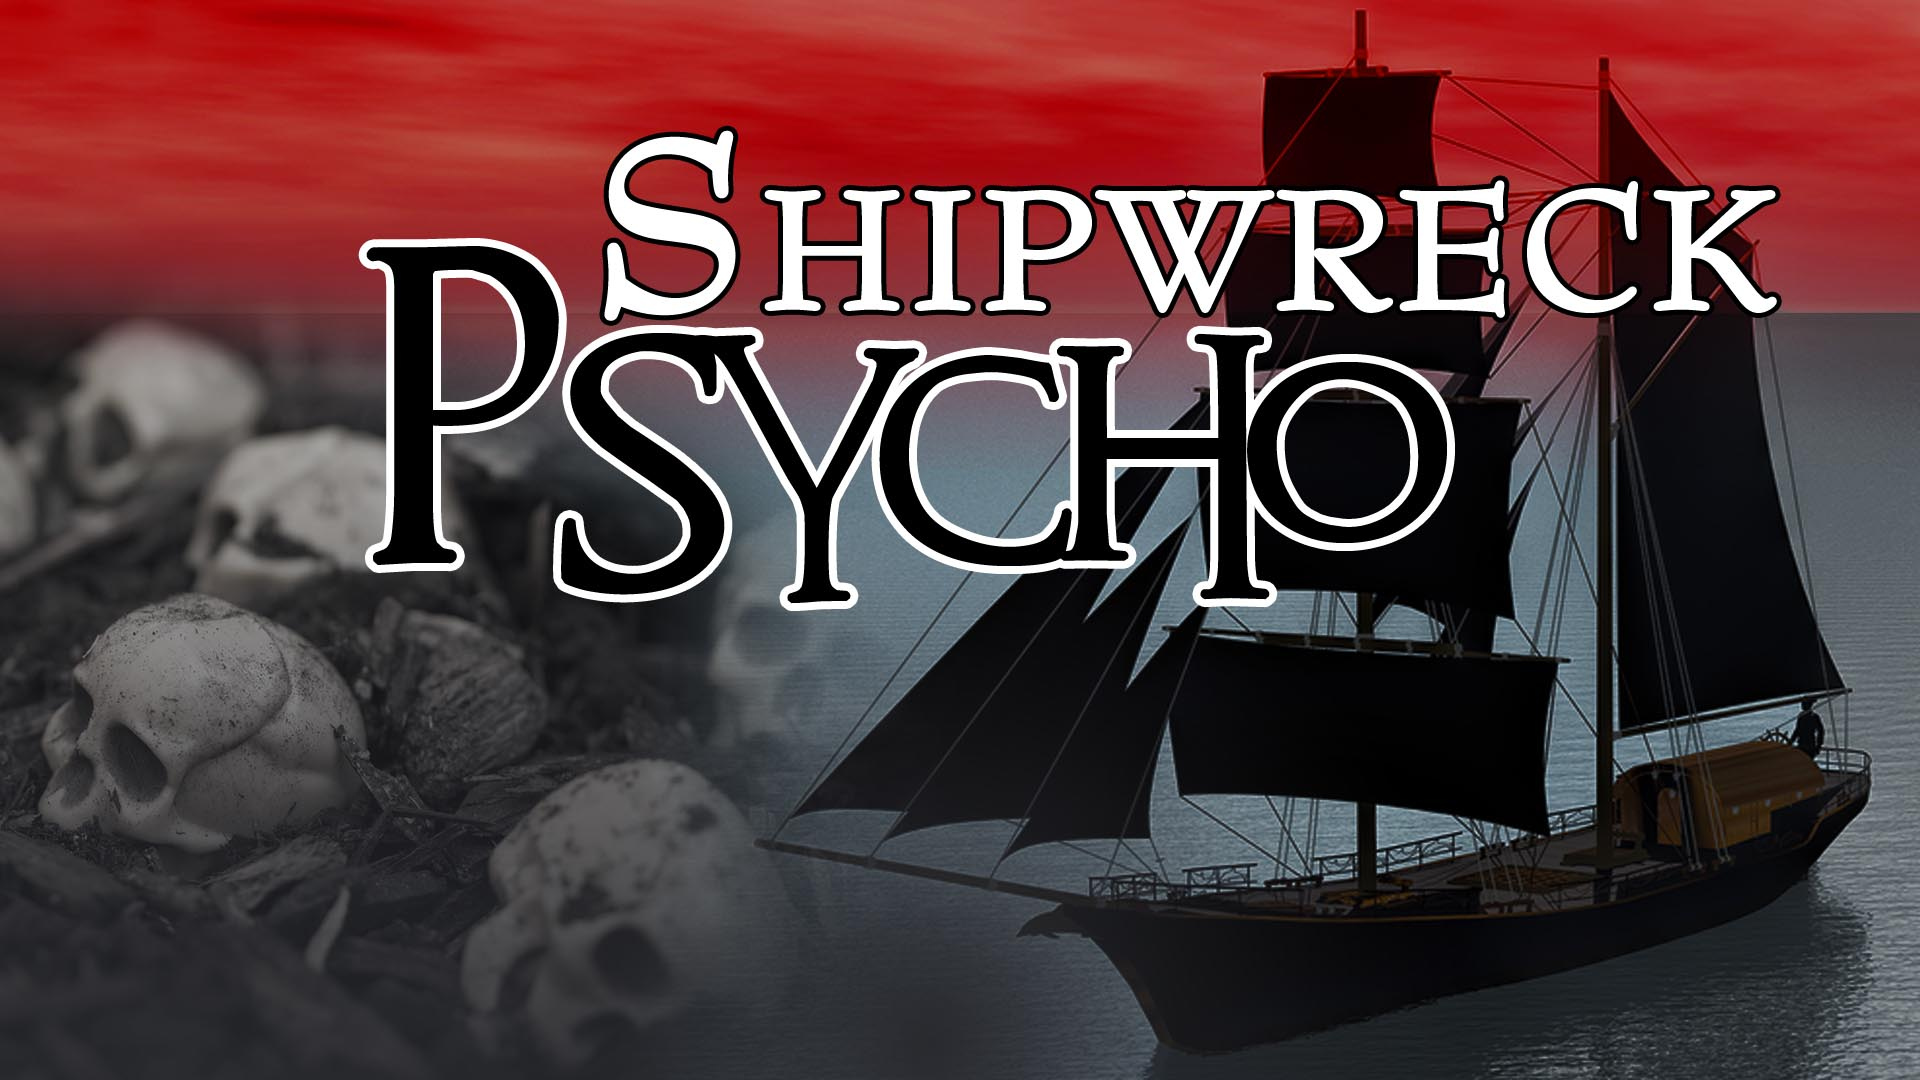 Shipwreck Psycho -